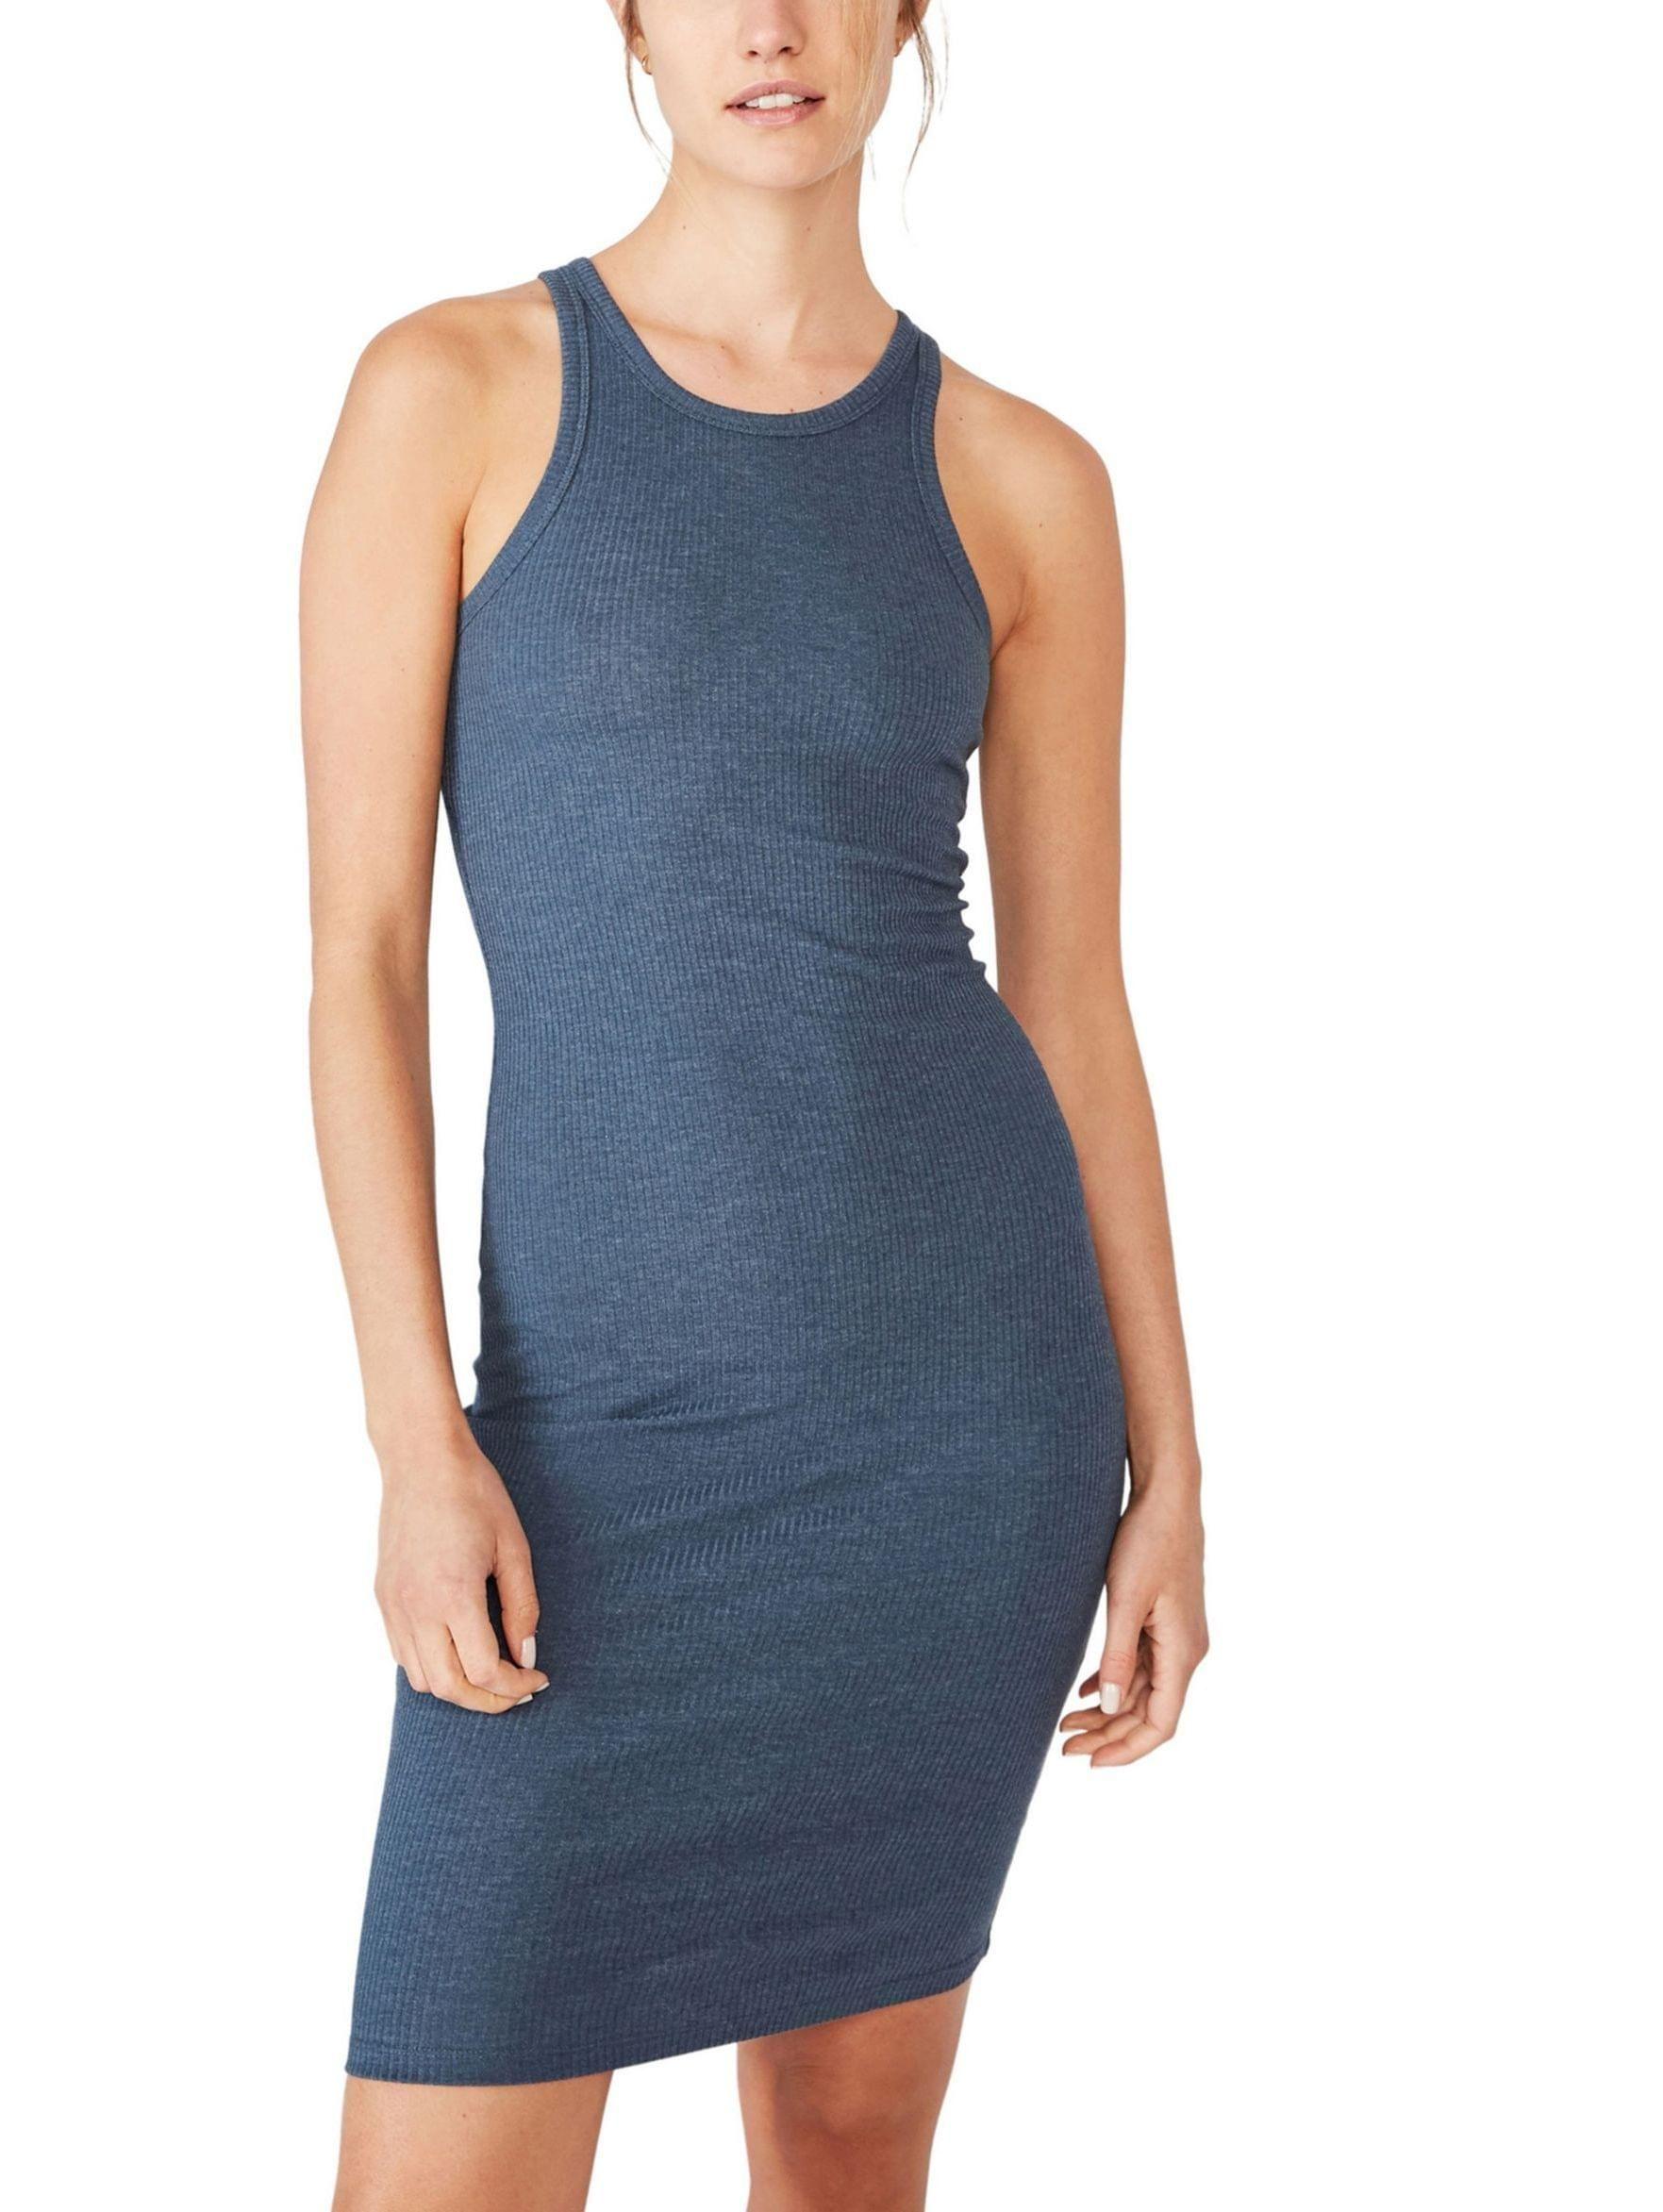 Women Kirsty Racerback Bodycon Midi Dress 24 Dresses Knitted Bodycon Dress Blue Midi Dress [ 2345 x 1763 Pixel ]